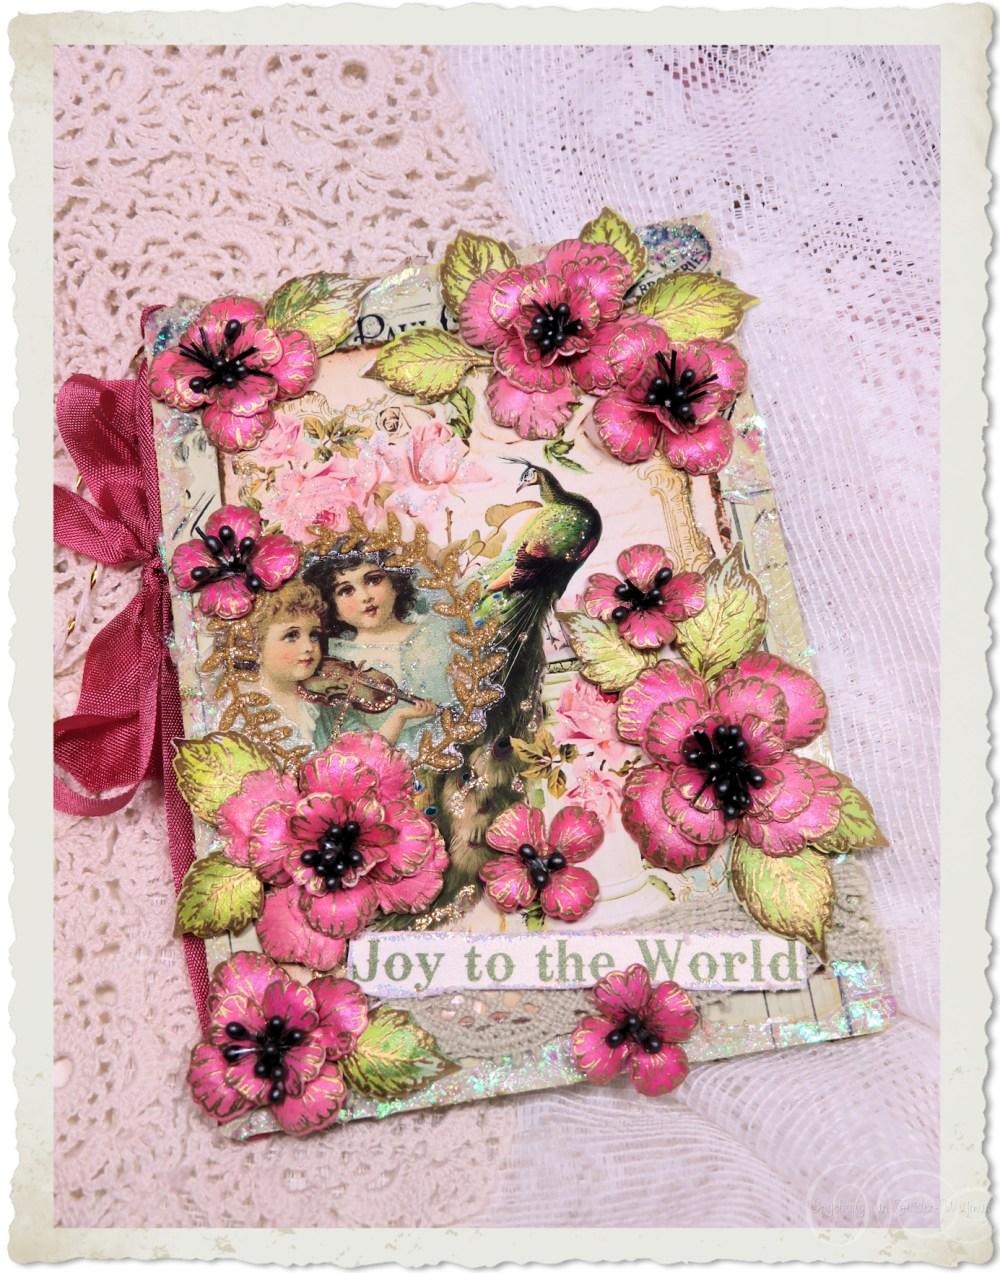 Handmade Joy to the World Christmas card by Ingeborg van Zuiden